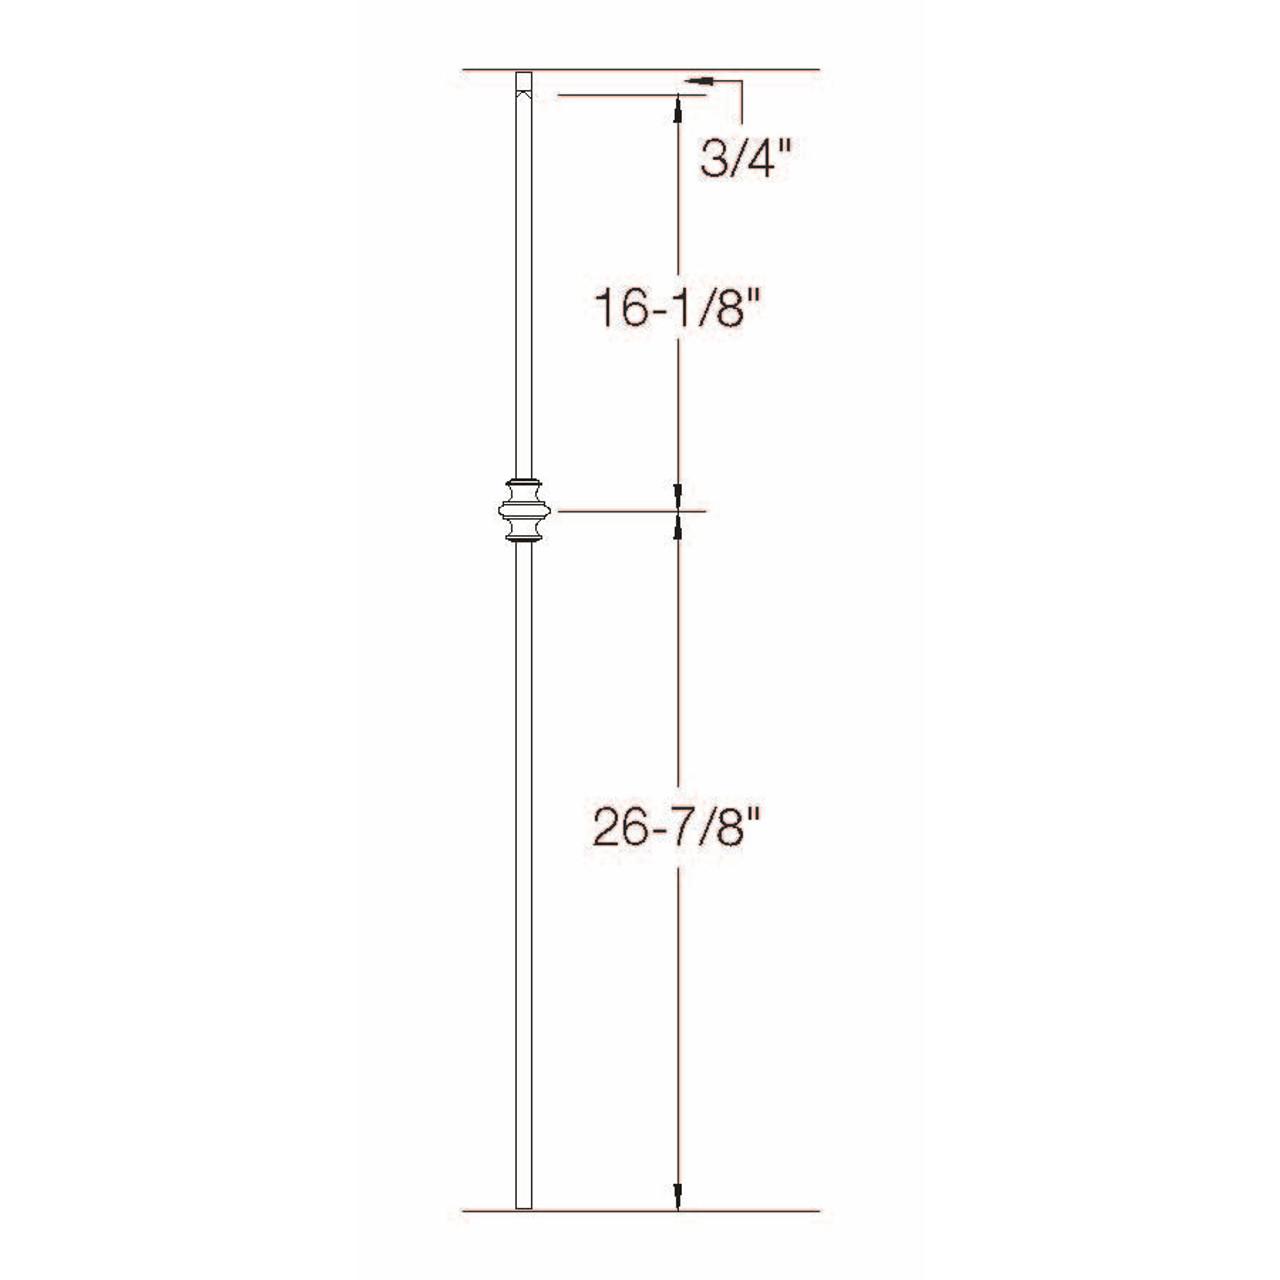 2G60 16mm Single Knuckle, Tubular Steel Dimensional Information